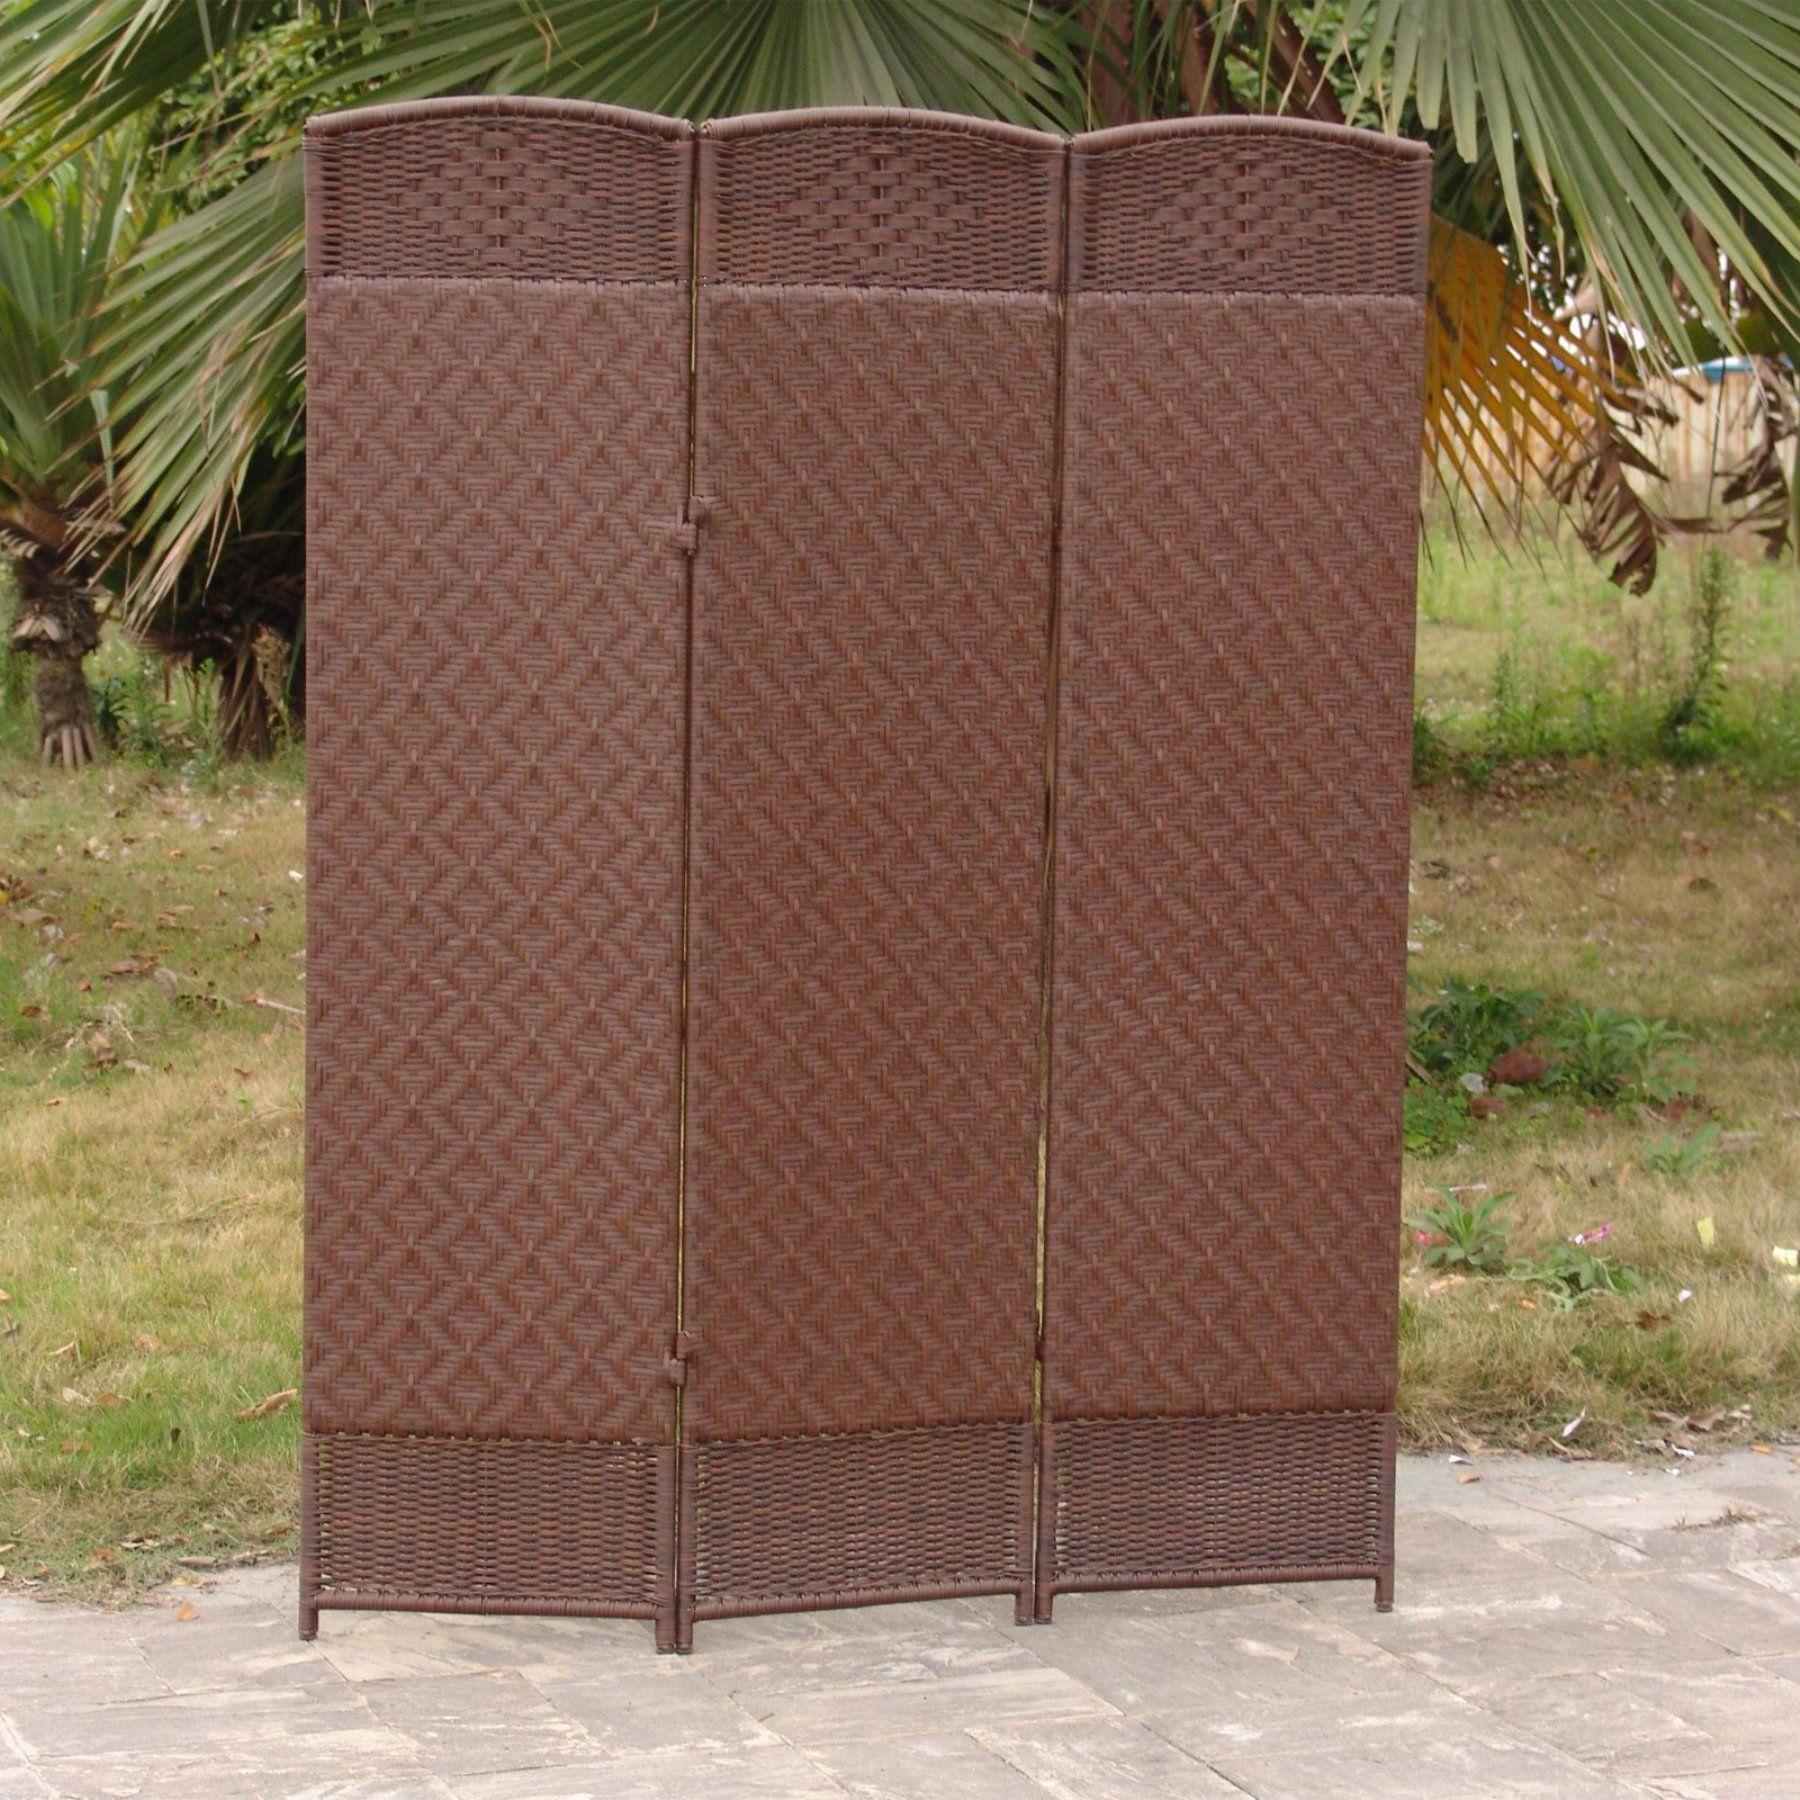 Outdoorindoor woven resin panel room divider cappuccino cdi